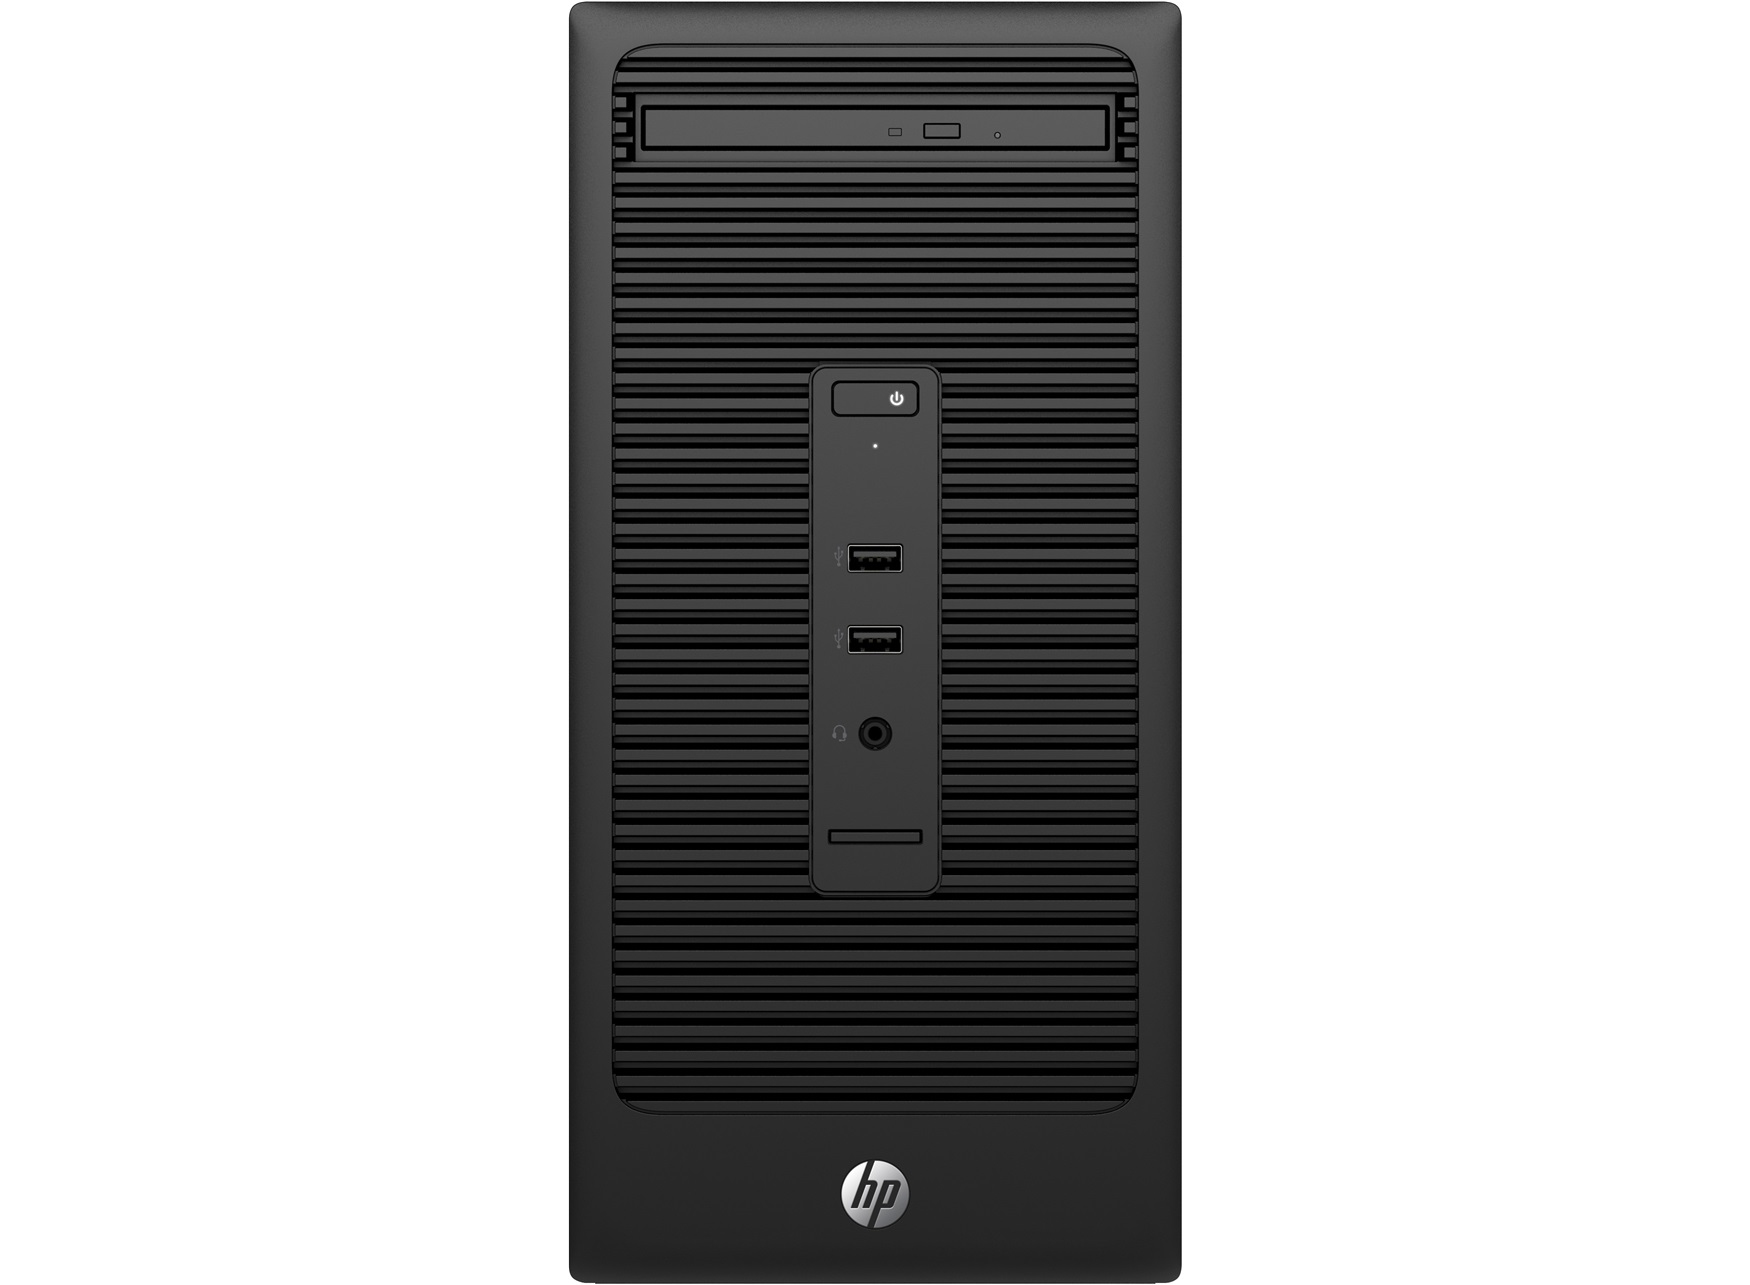 HP 200 280 G2 MT 3.3GHz G4400 Micro Tower Black